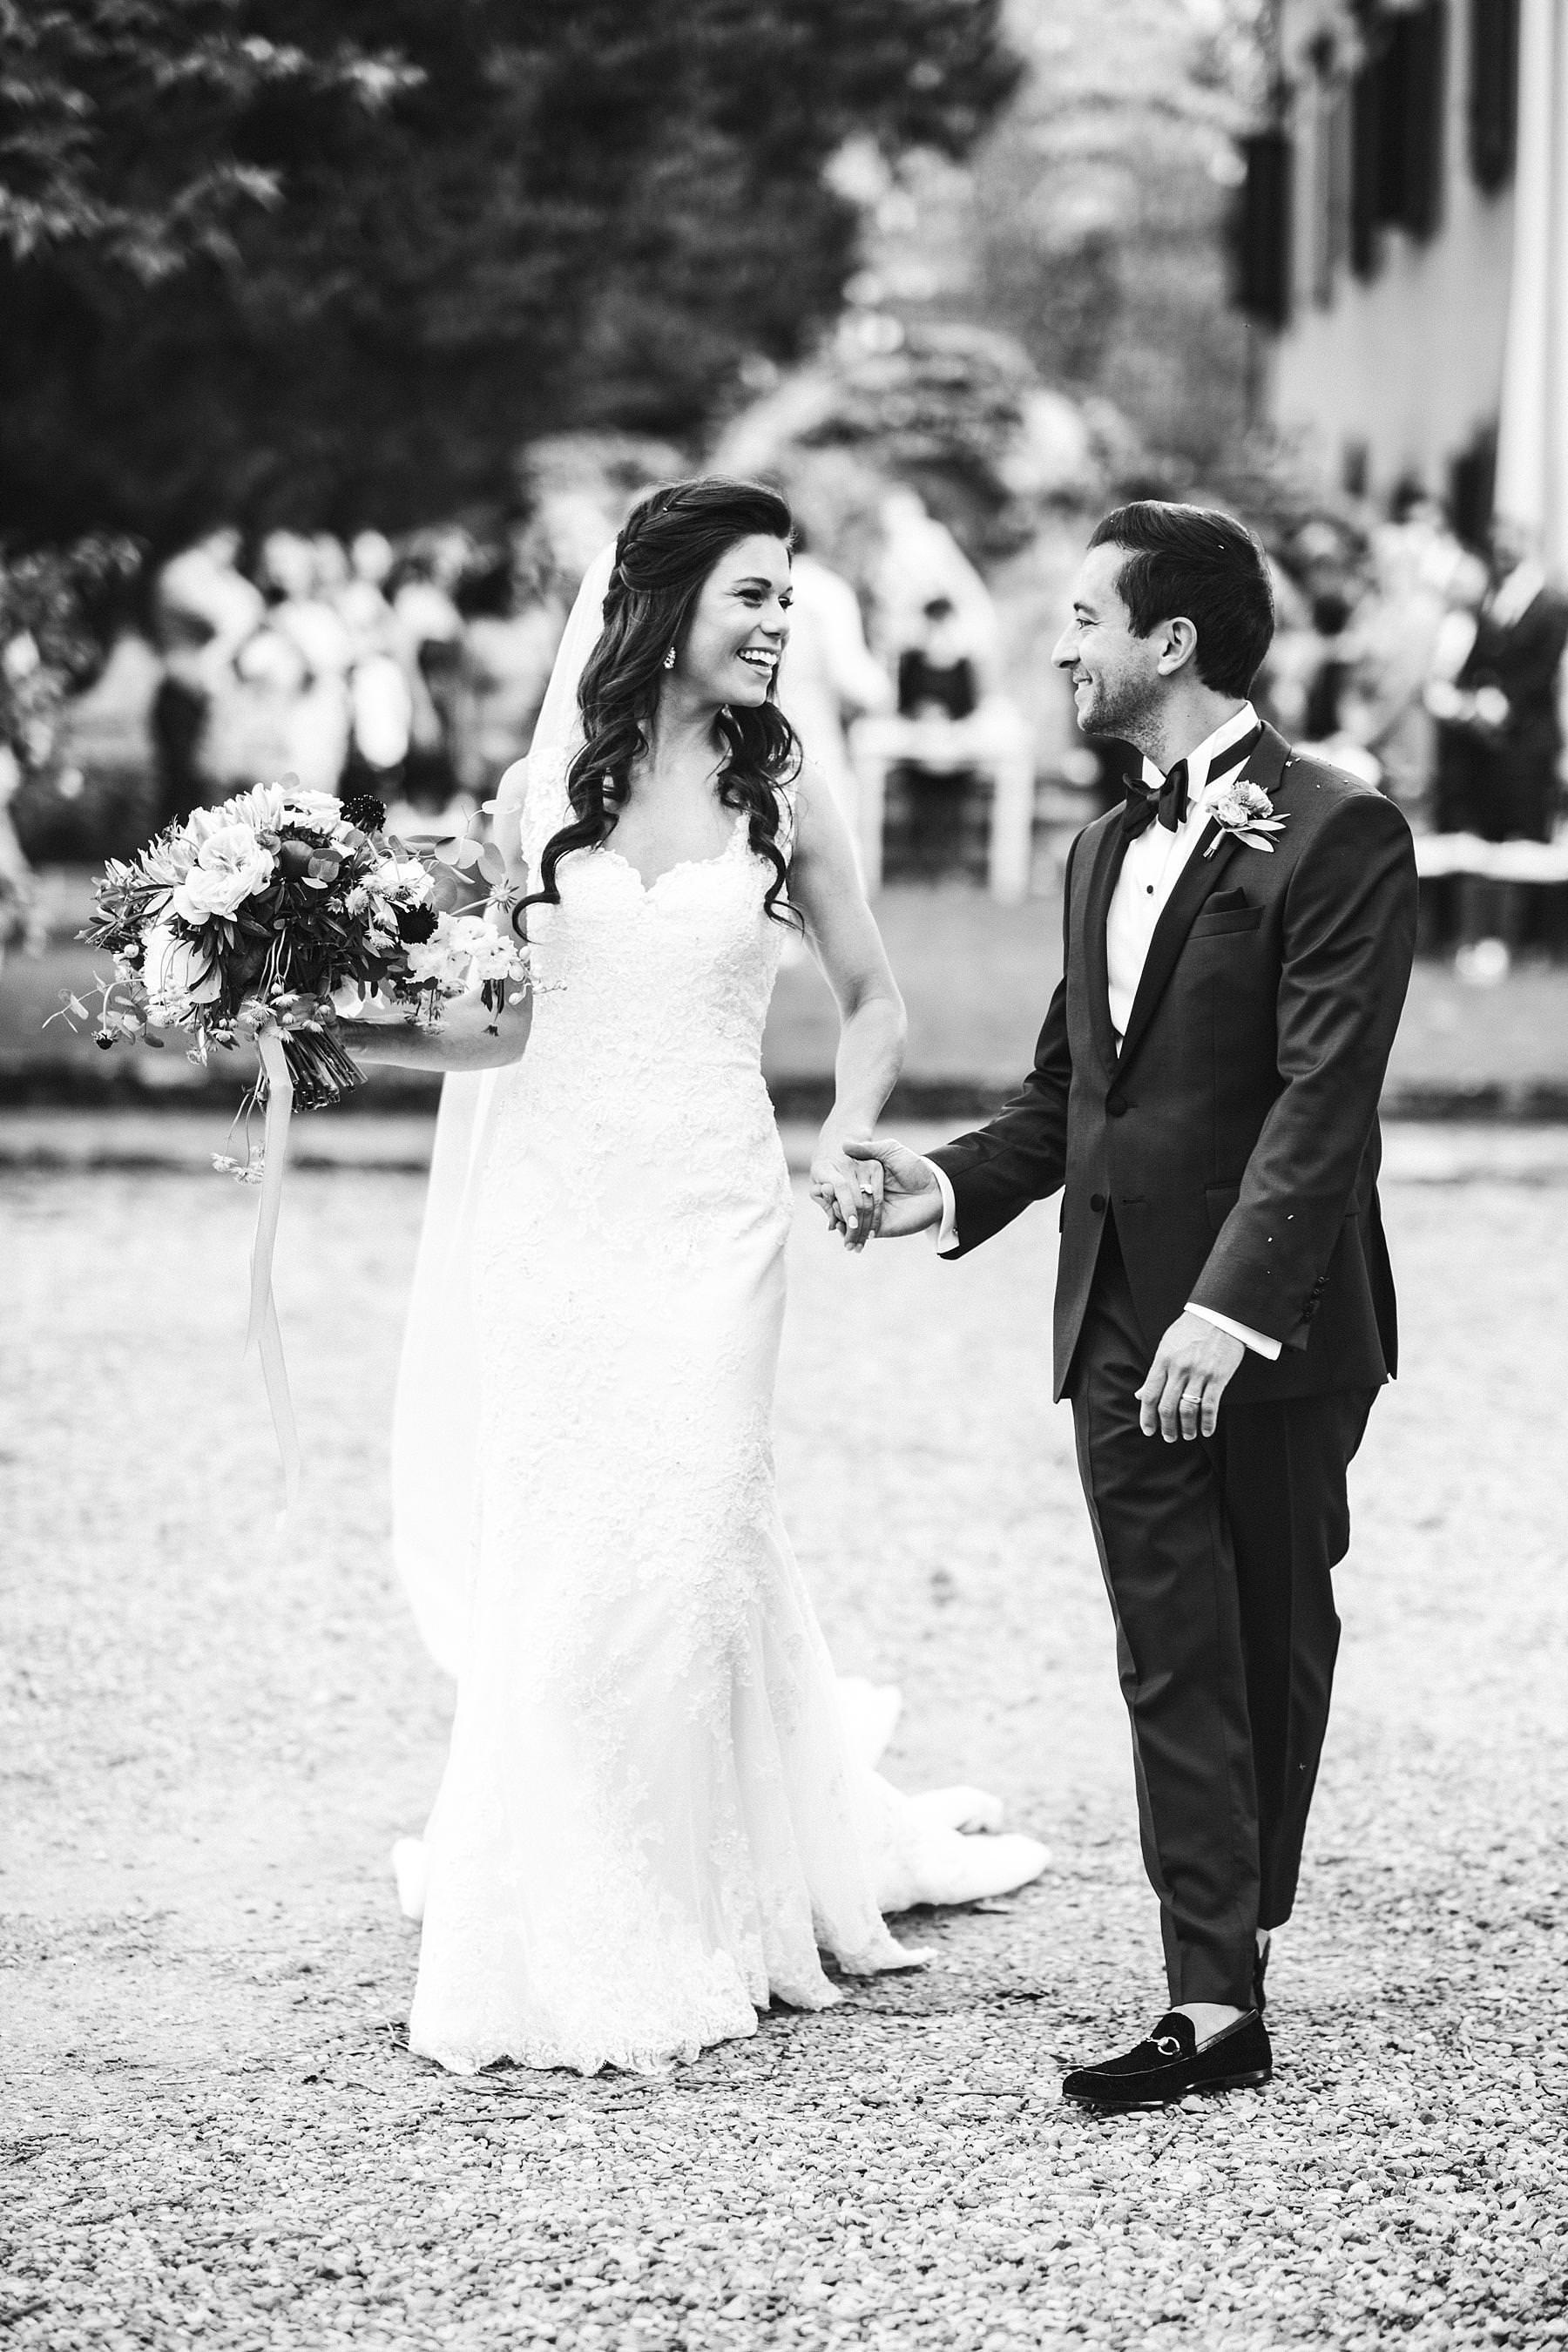 Elegant bride and groom. La Dolce Vita style destination wedding in Italy at historic estate of Villa La Selva Wine Resort located in the beautiful Tuscany countryside